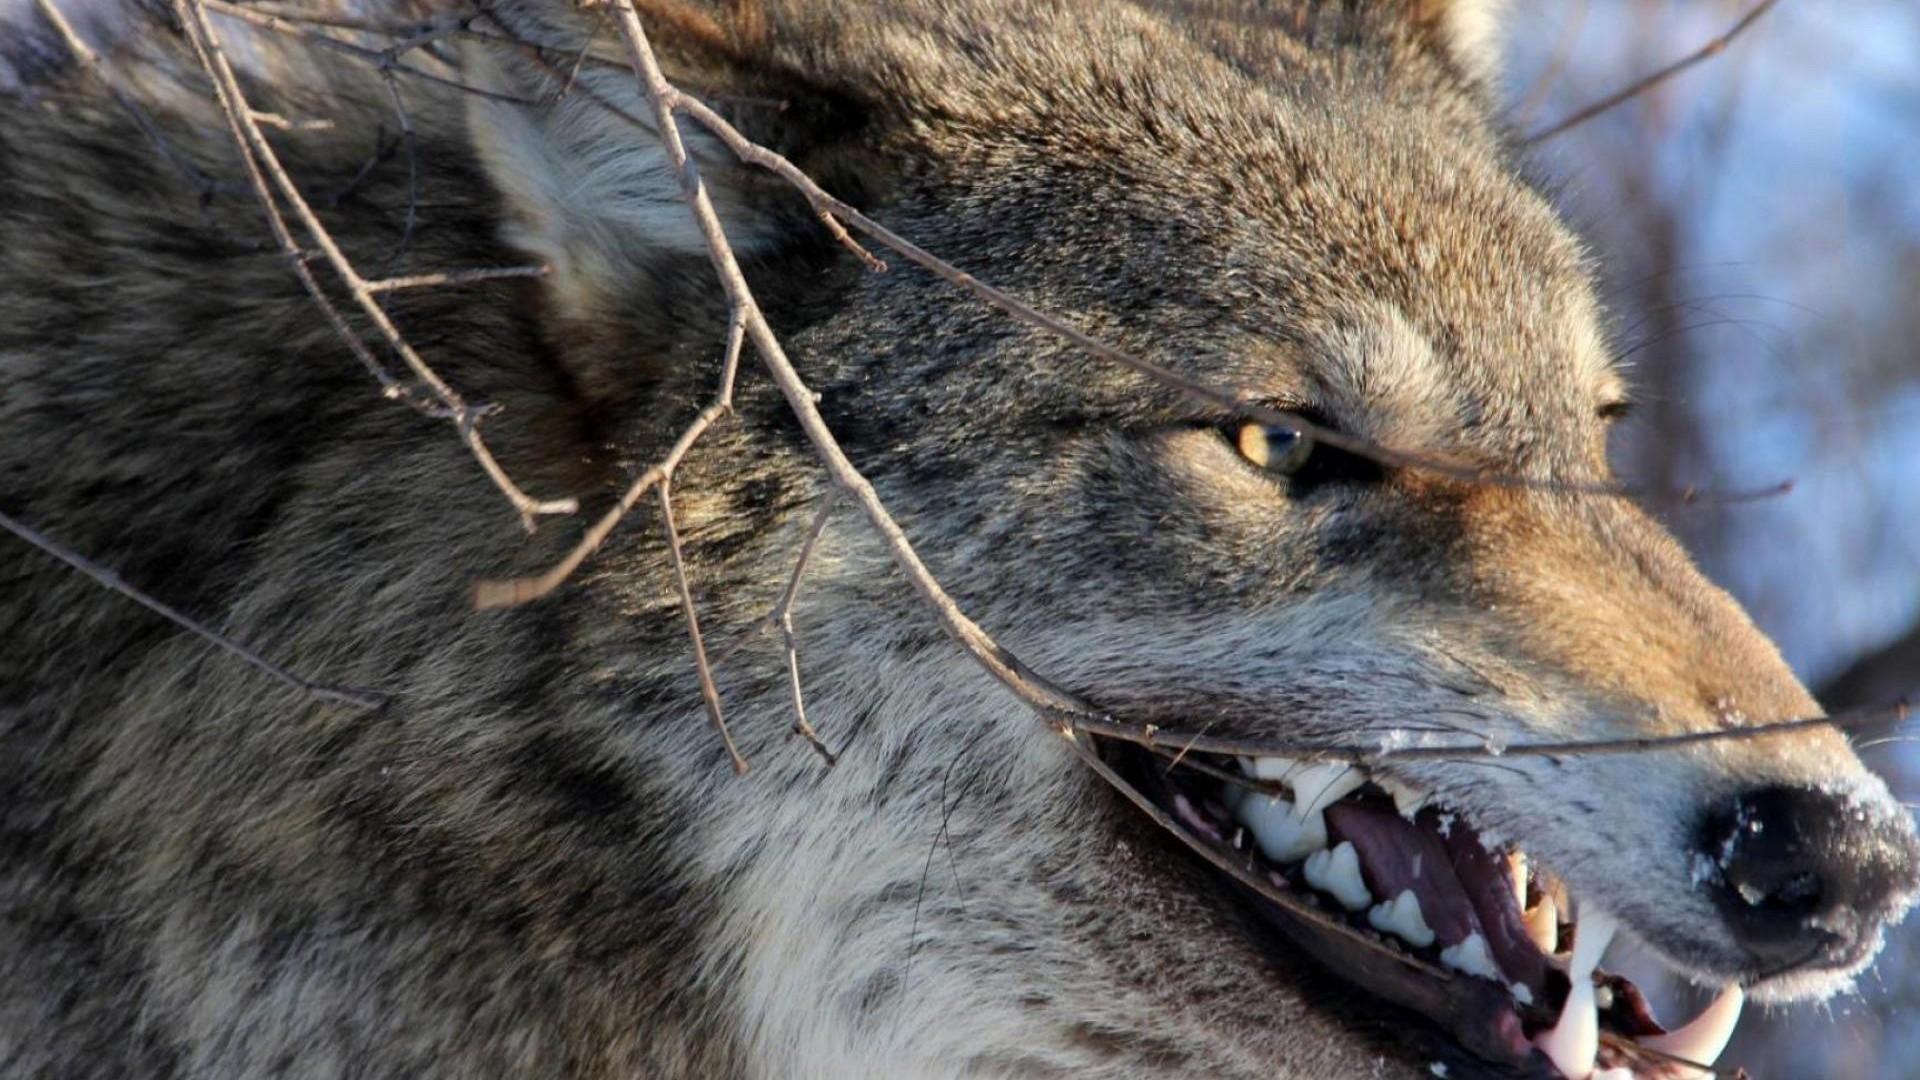 оскал волка фото на рабочий стол клиника курортологии один